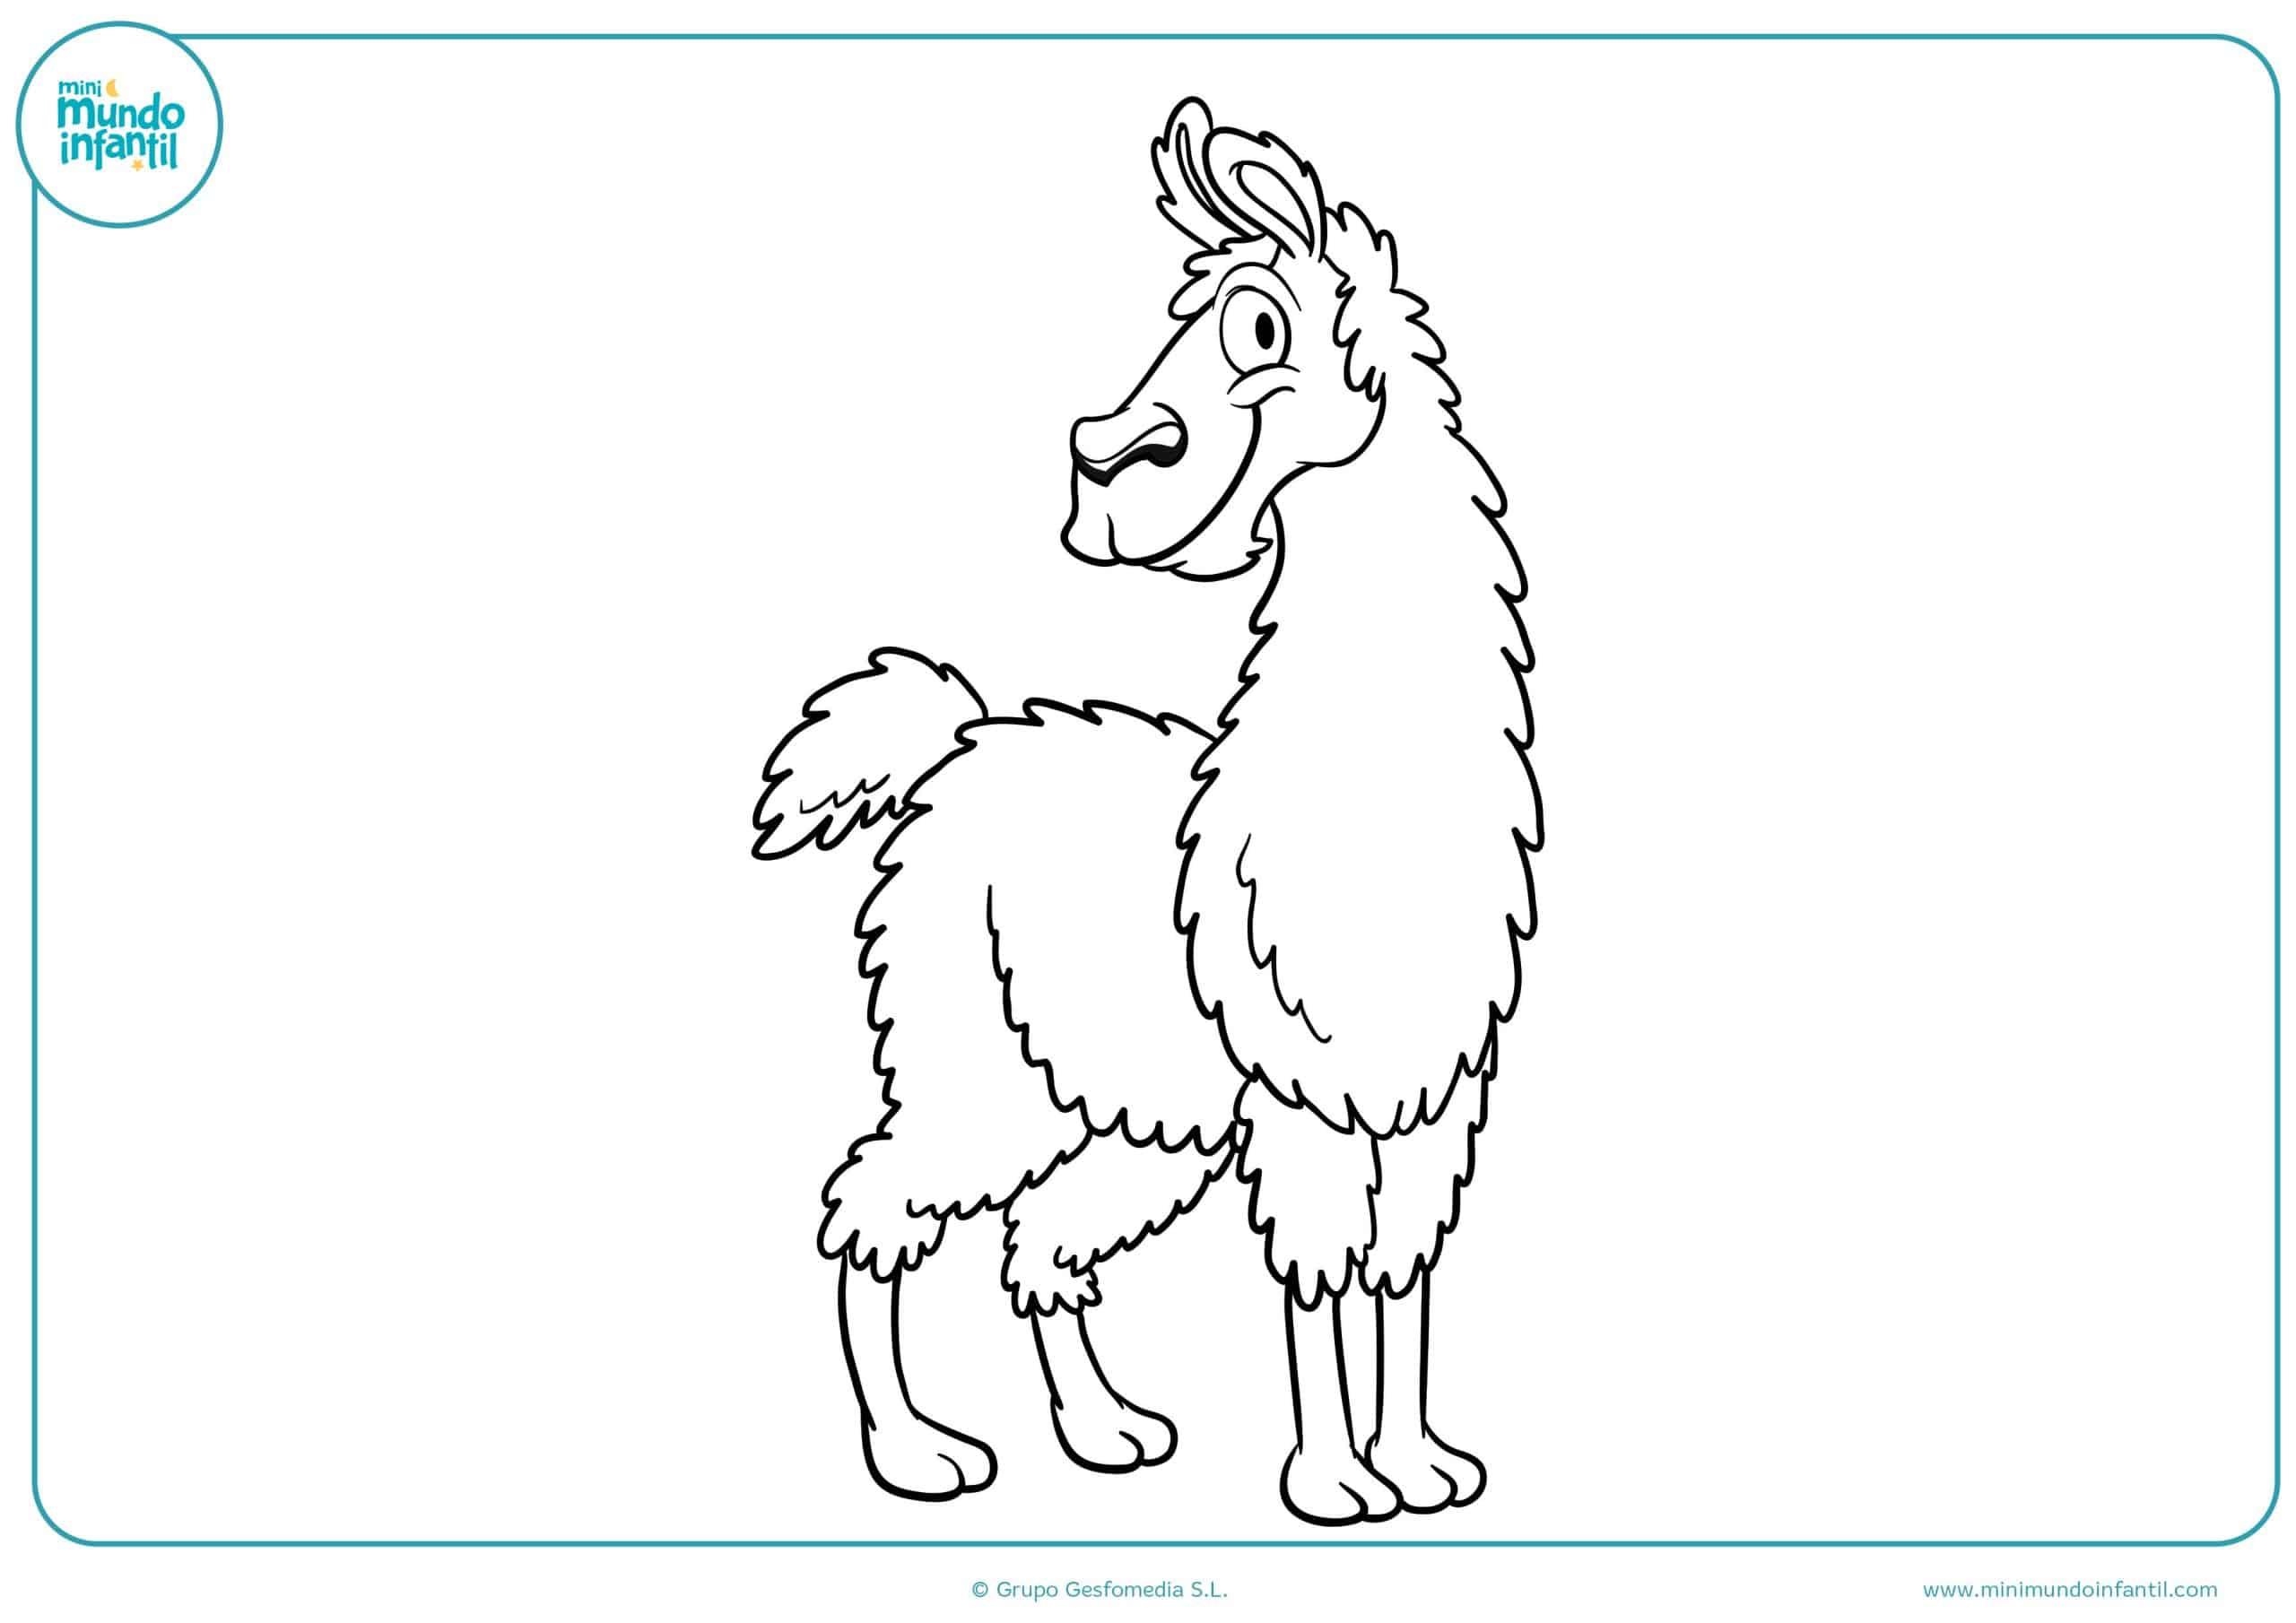 Dibujos Para Colorear De Fortnite: Dibujo Fortnite Para Dibujar